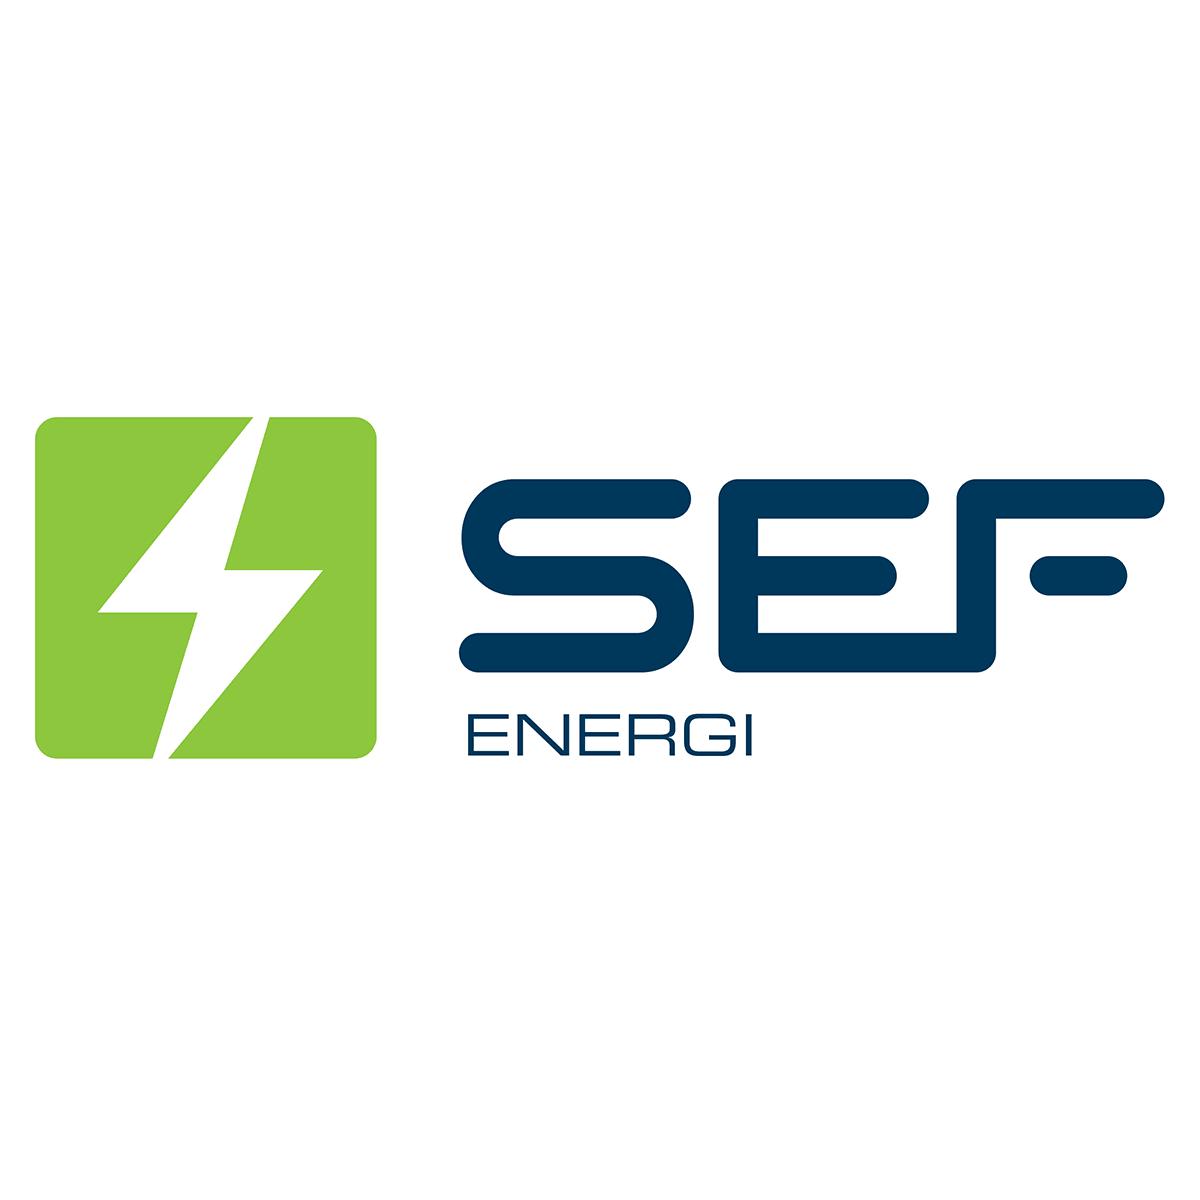 sef-energi-logo